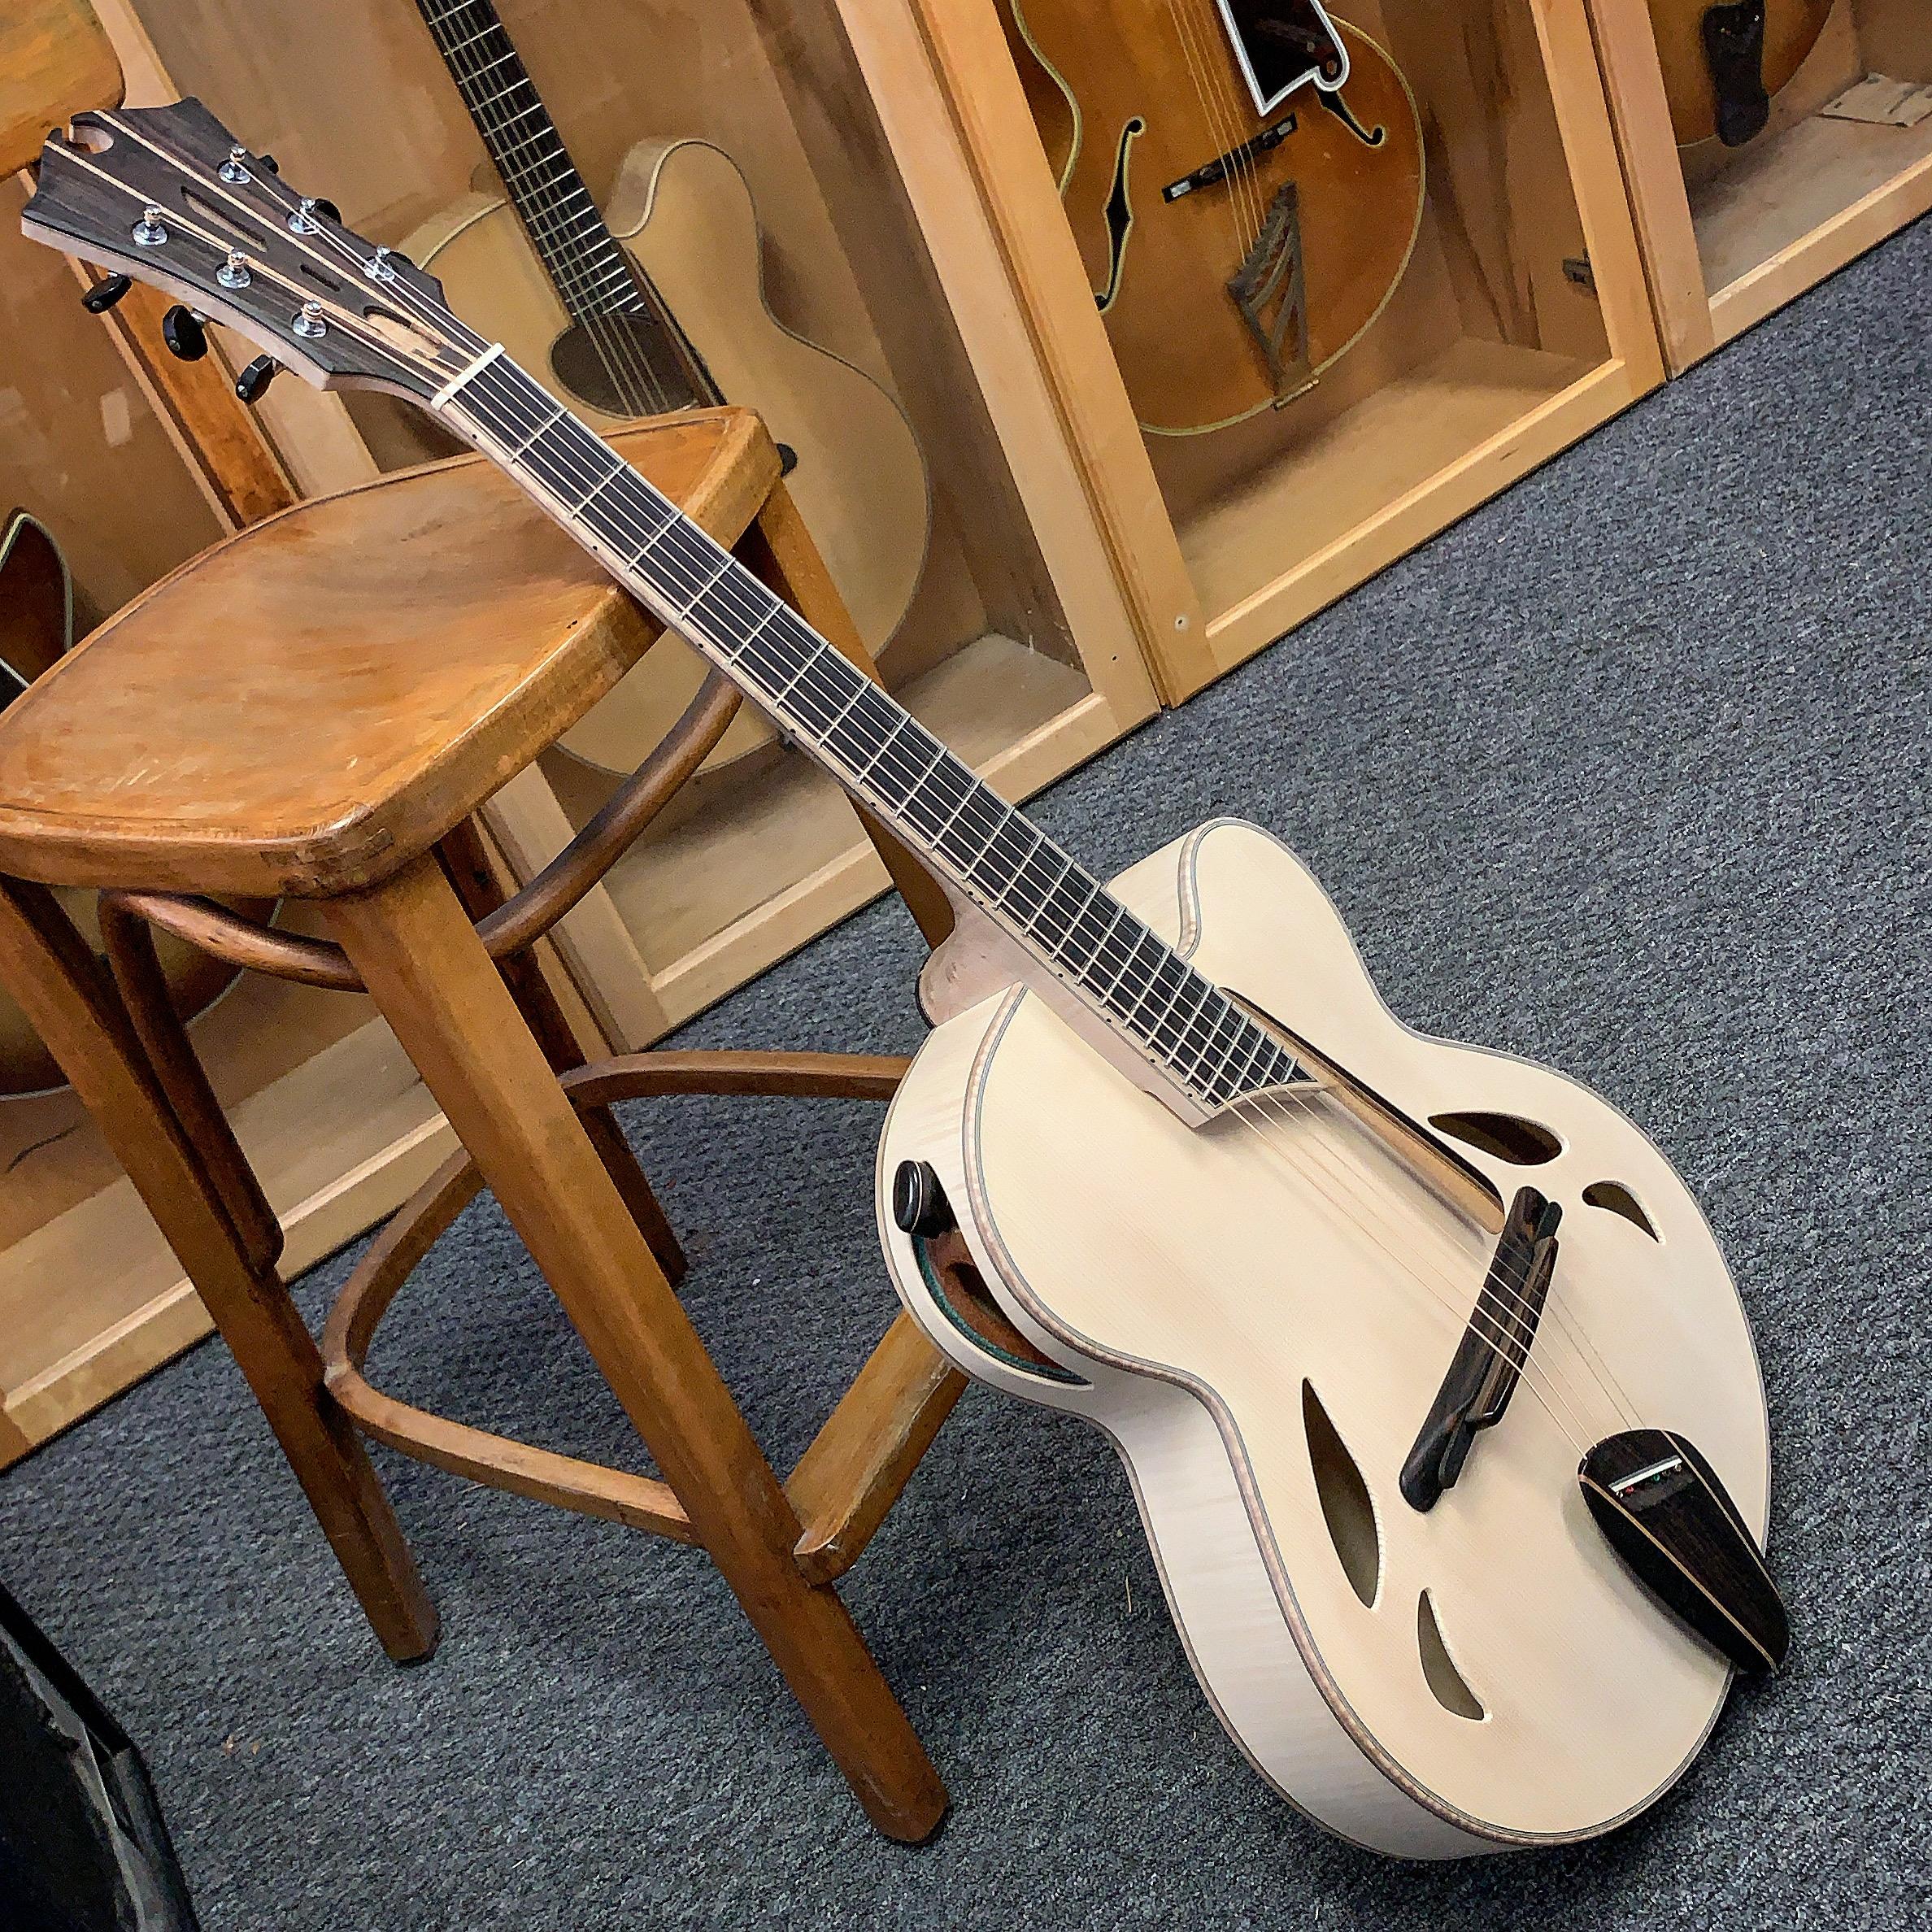 Mirabella build tread on The North American Guitar-9bf68467-b4c4-4f47-9ba8-155359d50d95-jpeg